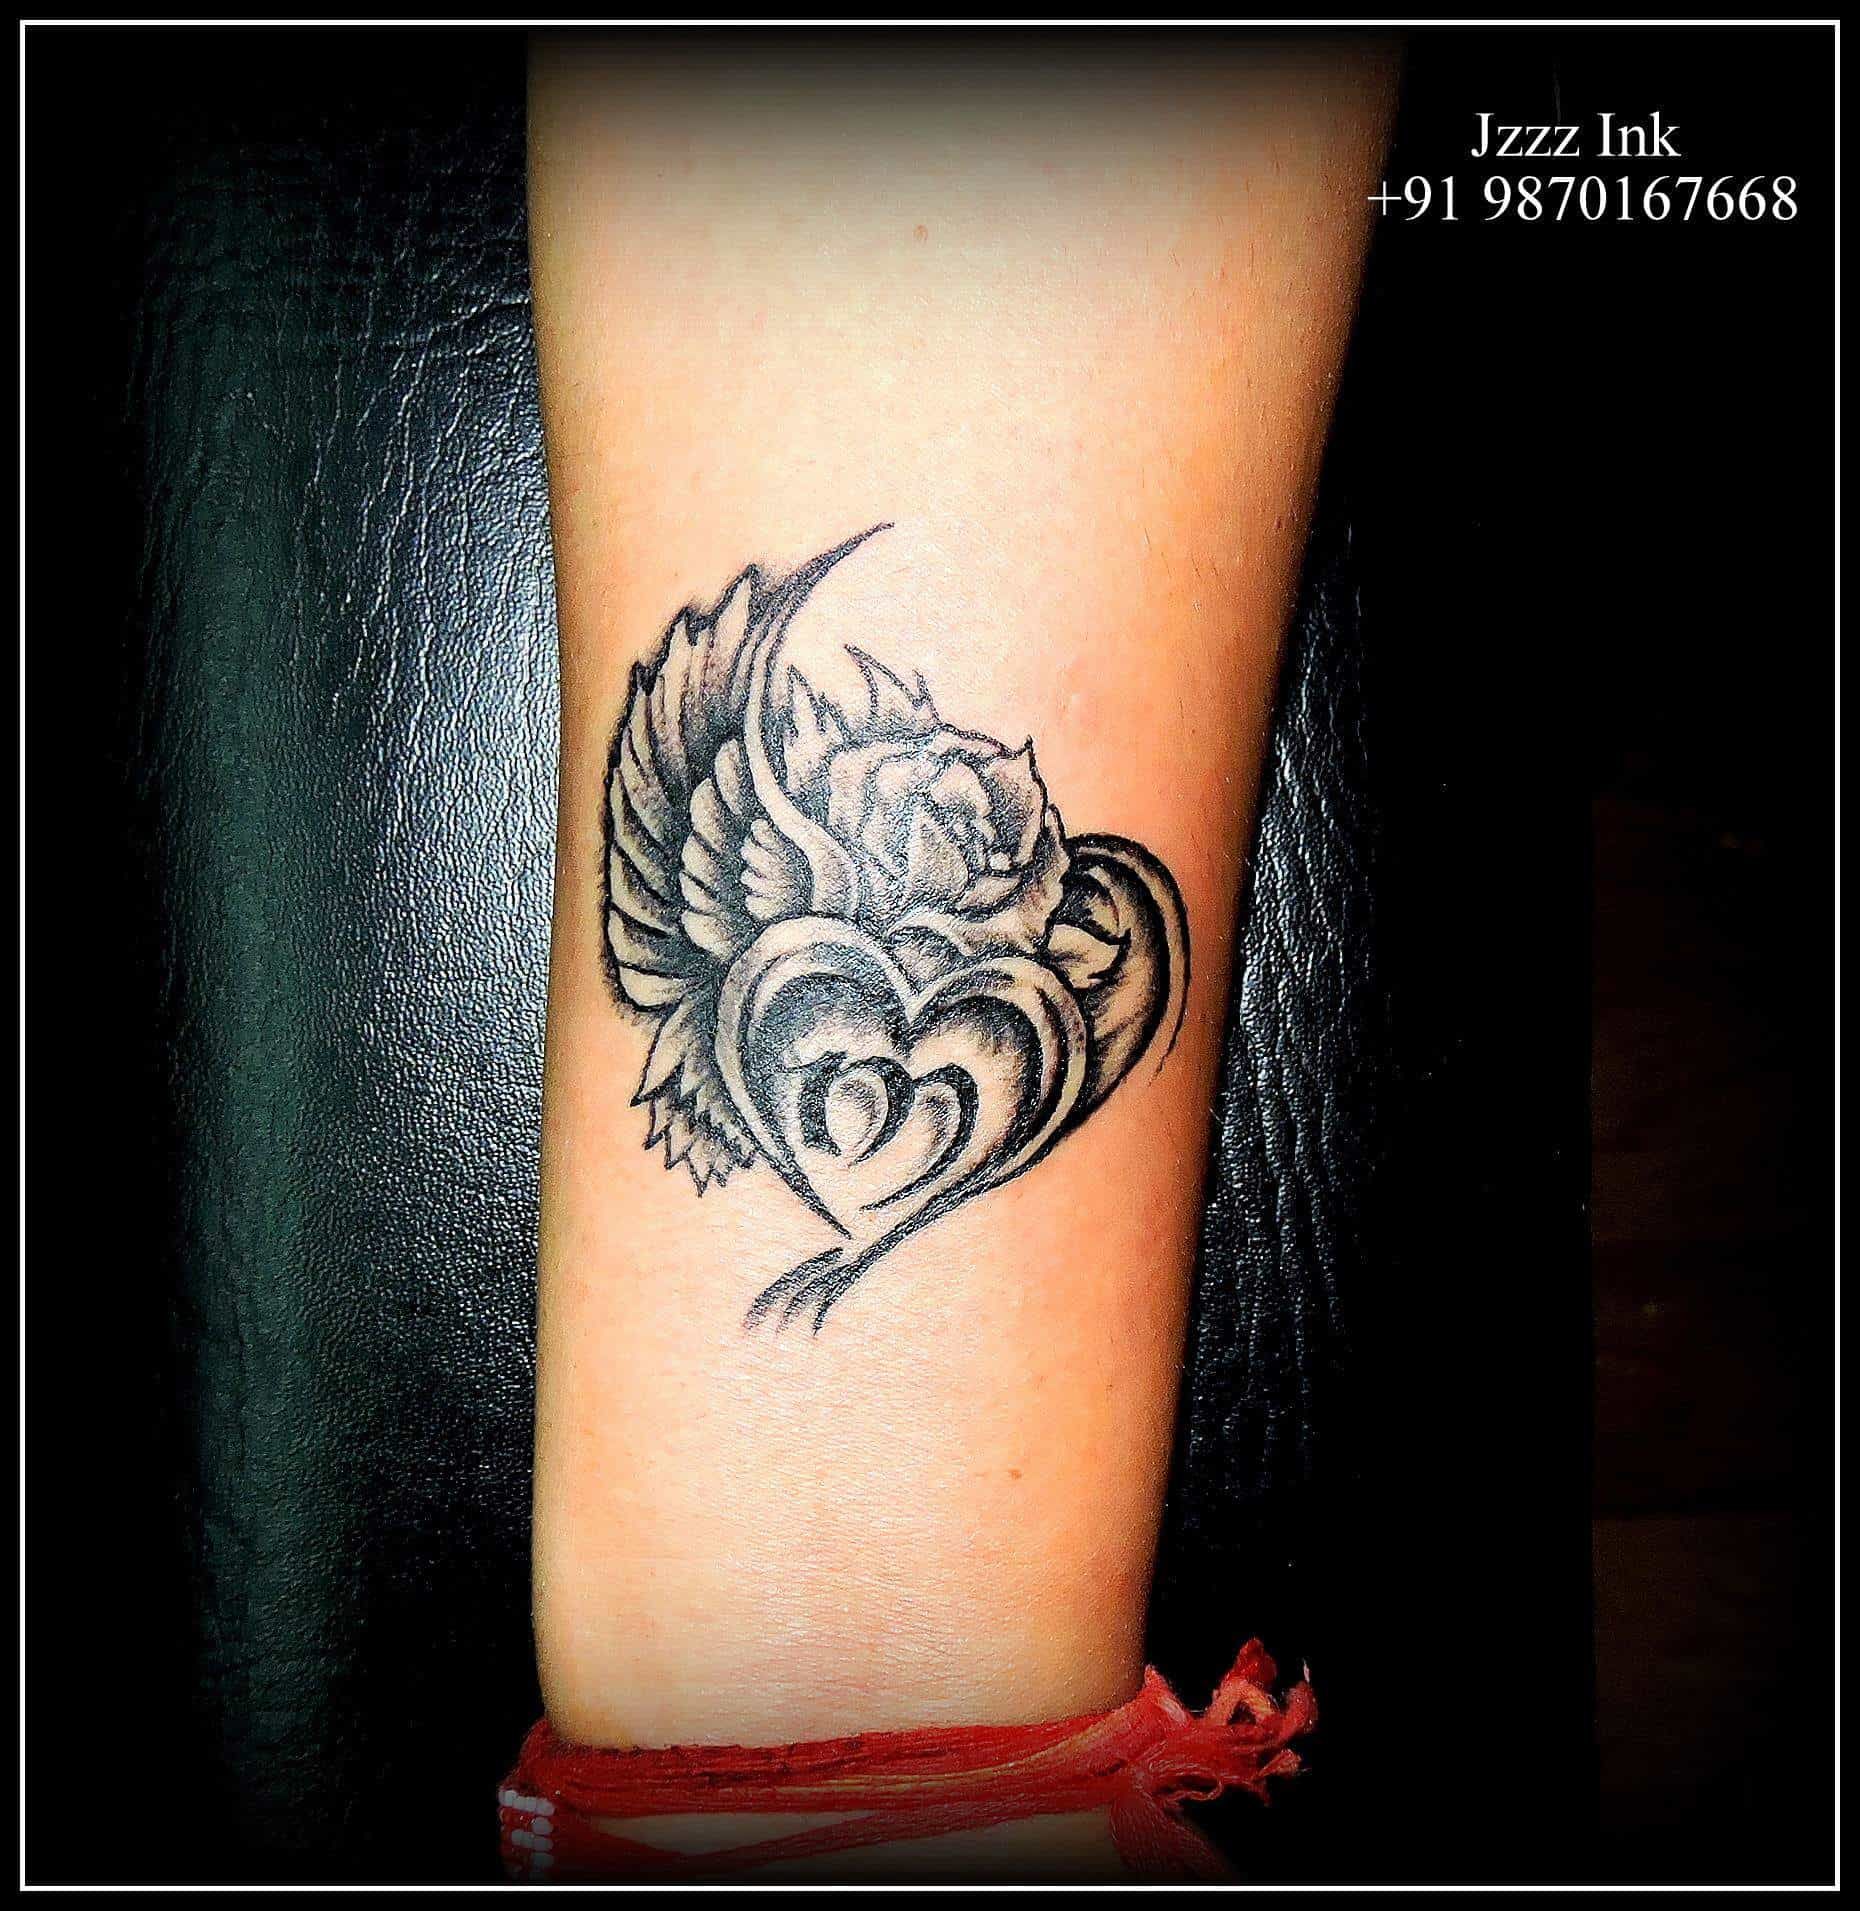 15 Best Forearm Tattoos Done At Iron Buzz Tattoos Mumbai: J K Tattoos Studio Marine Lines